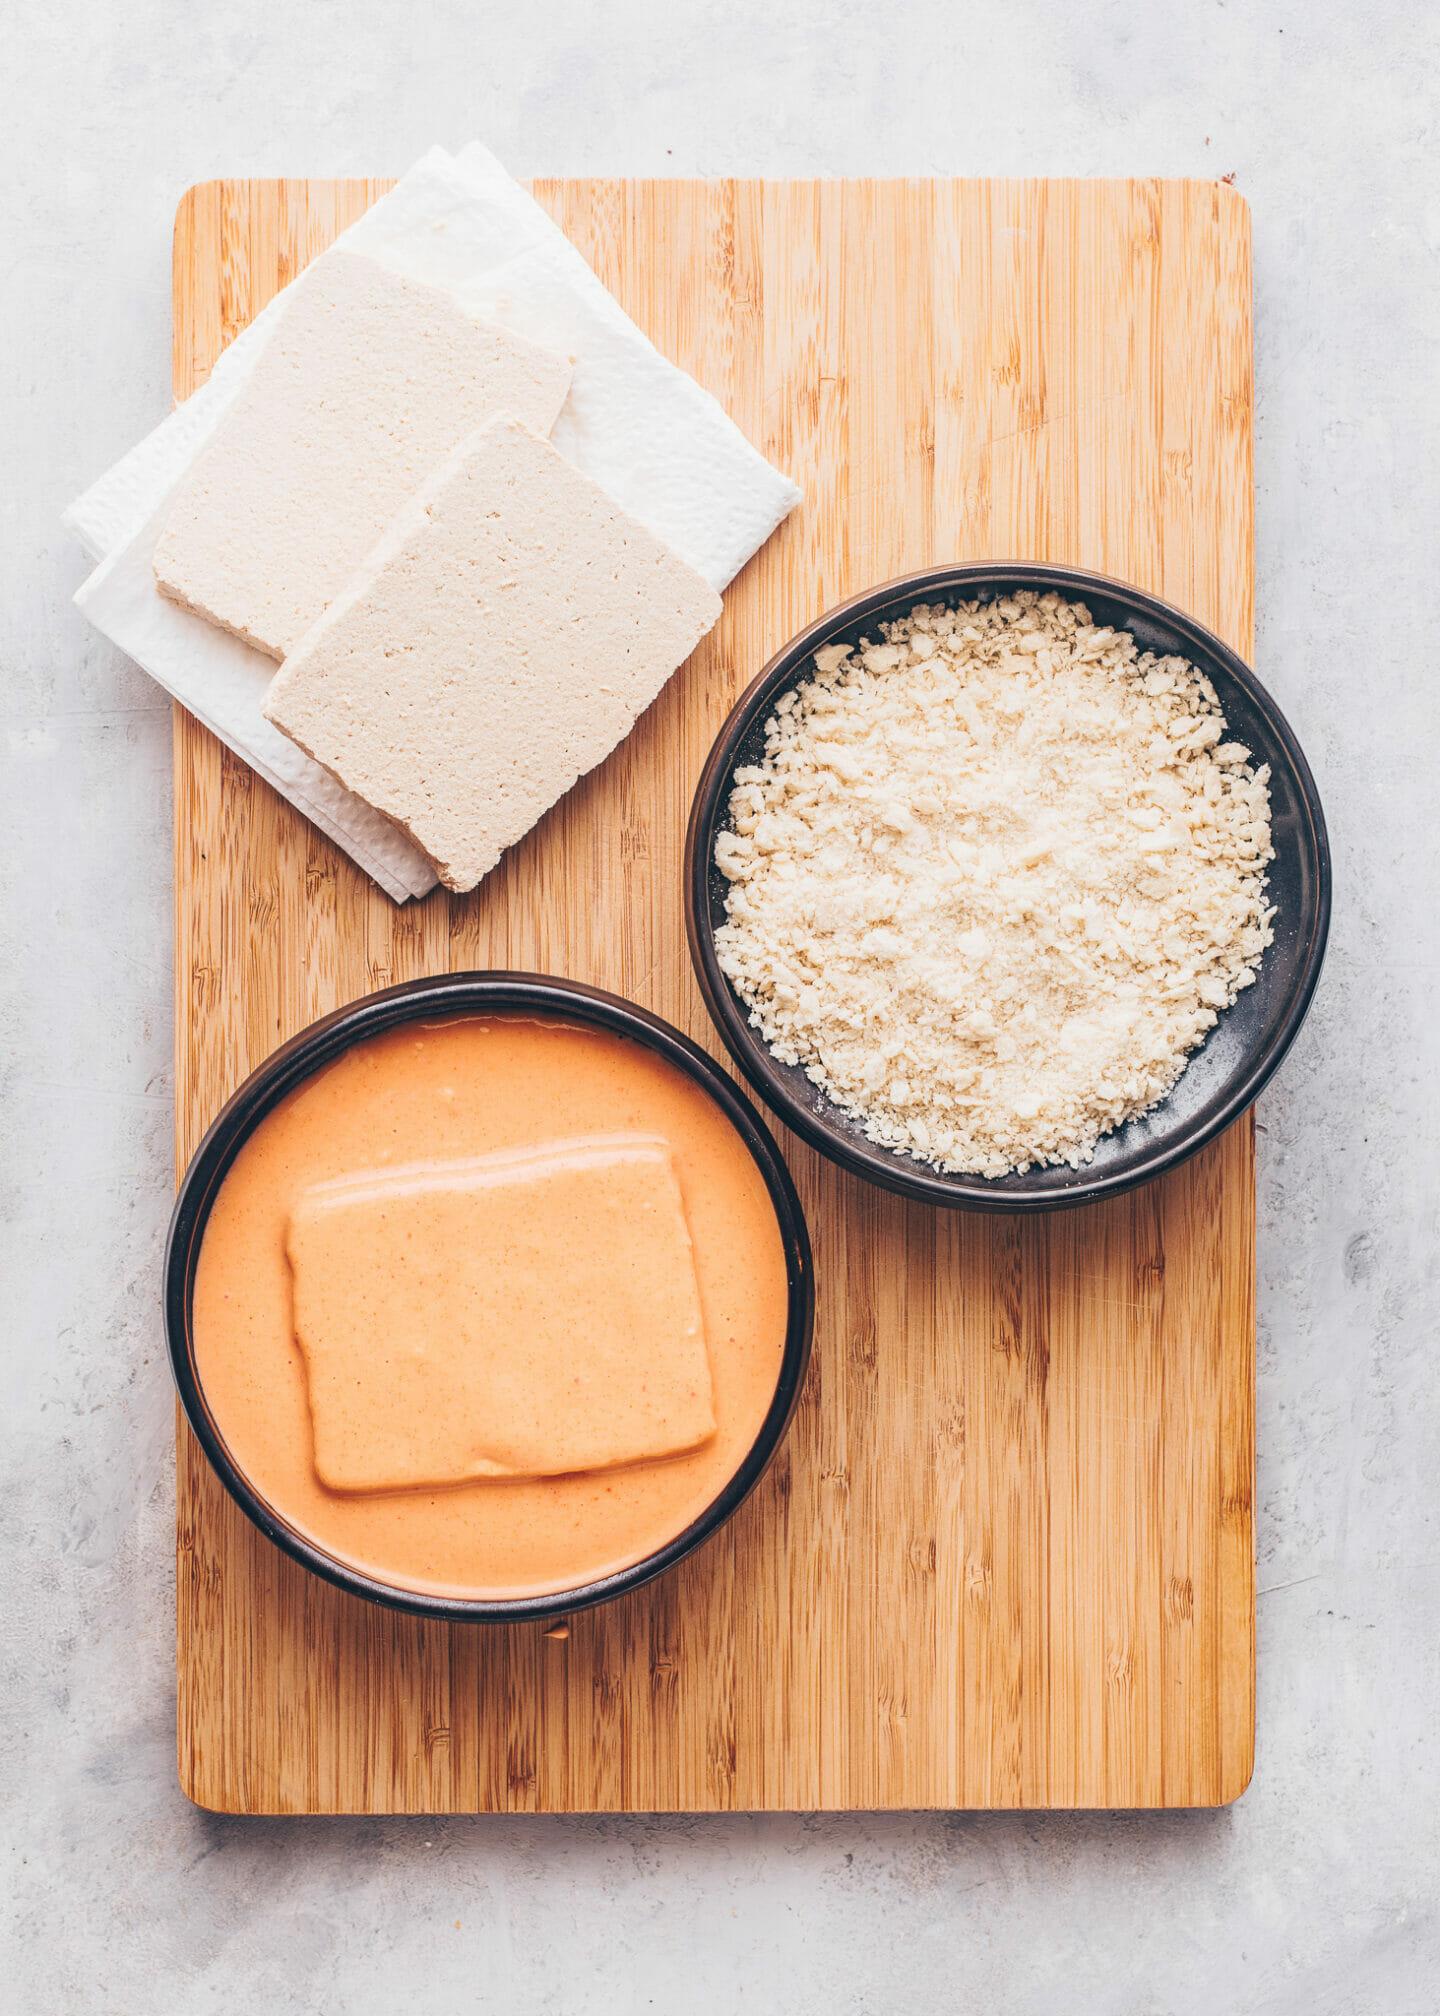 Tofu Katsu step-by-step recipe